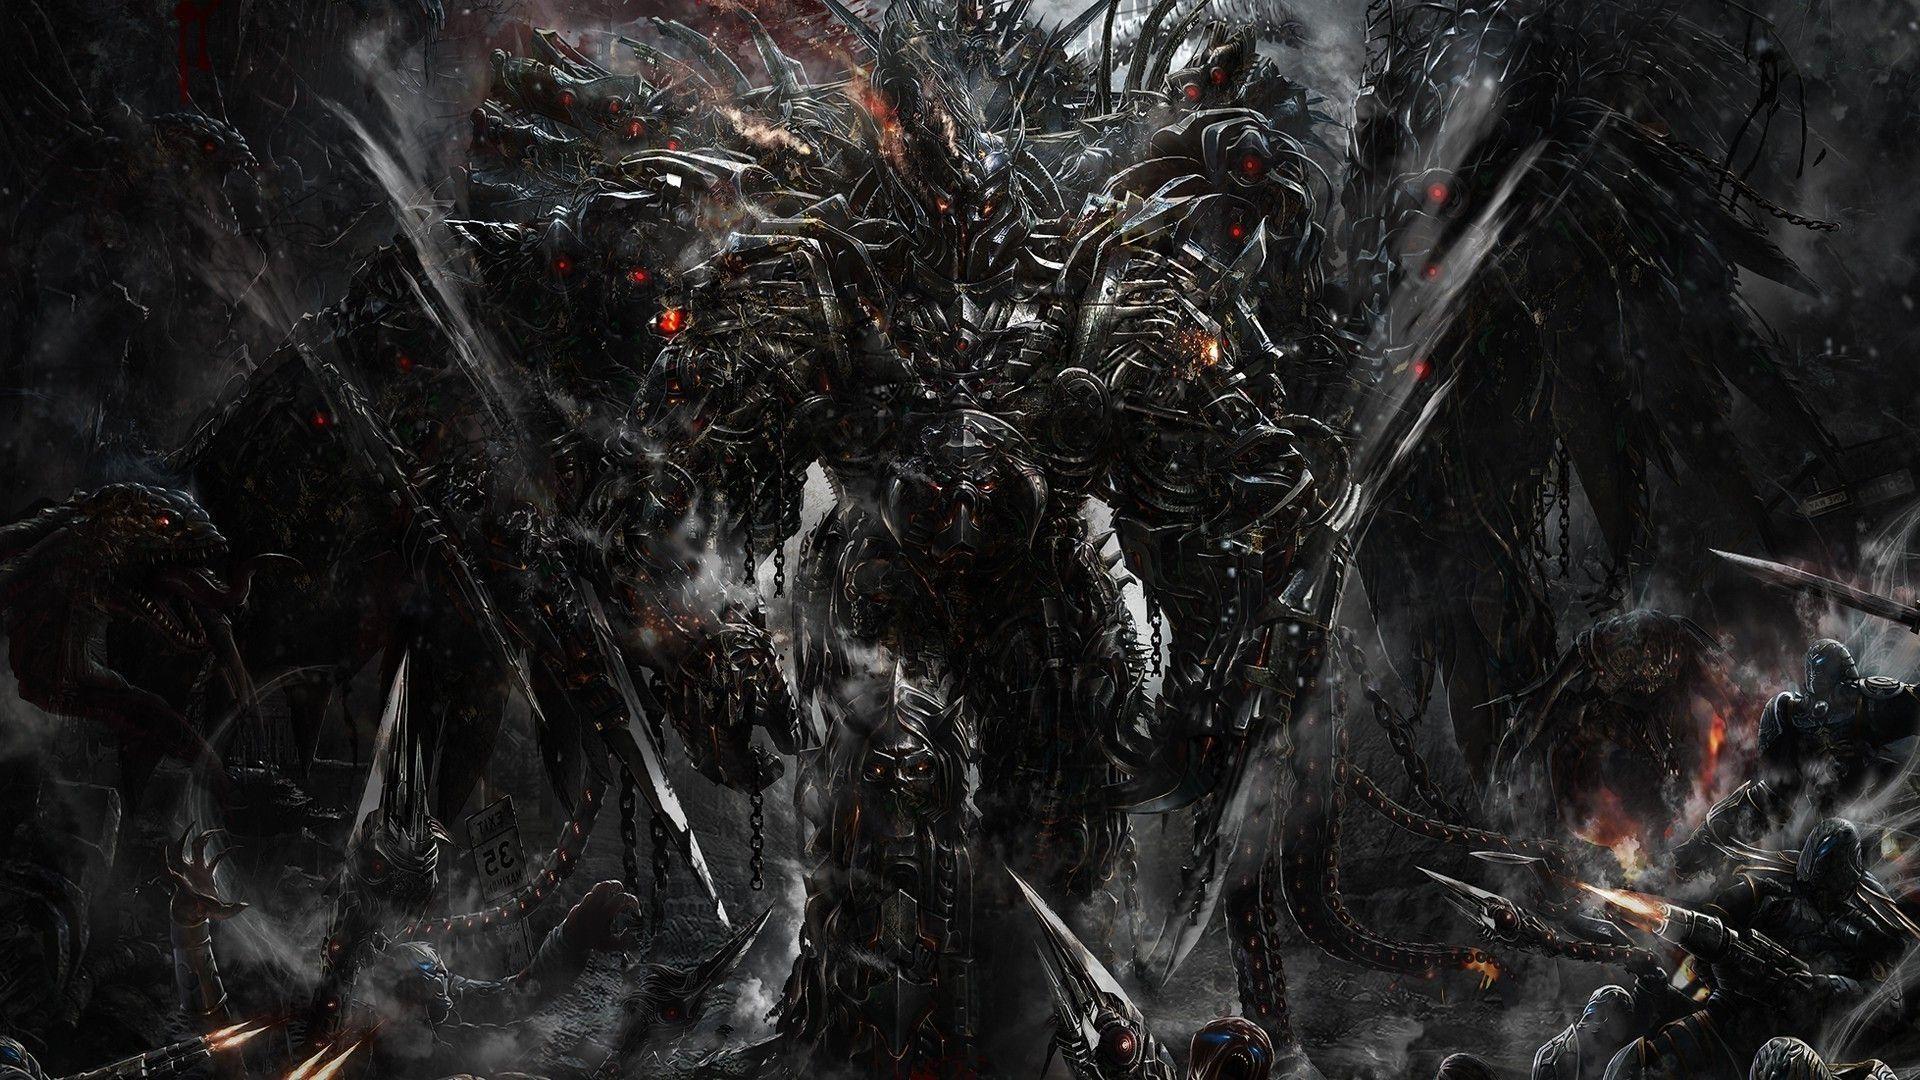 Death Metal Wallpapers - Top Free Death Metal Backgrounds ...